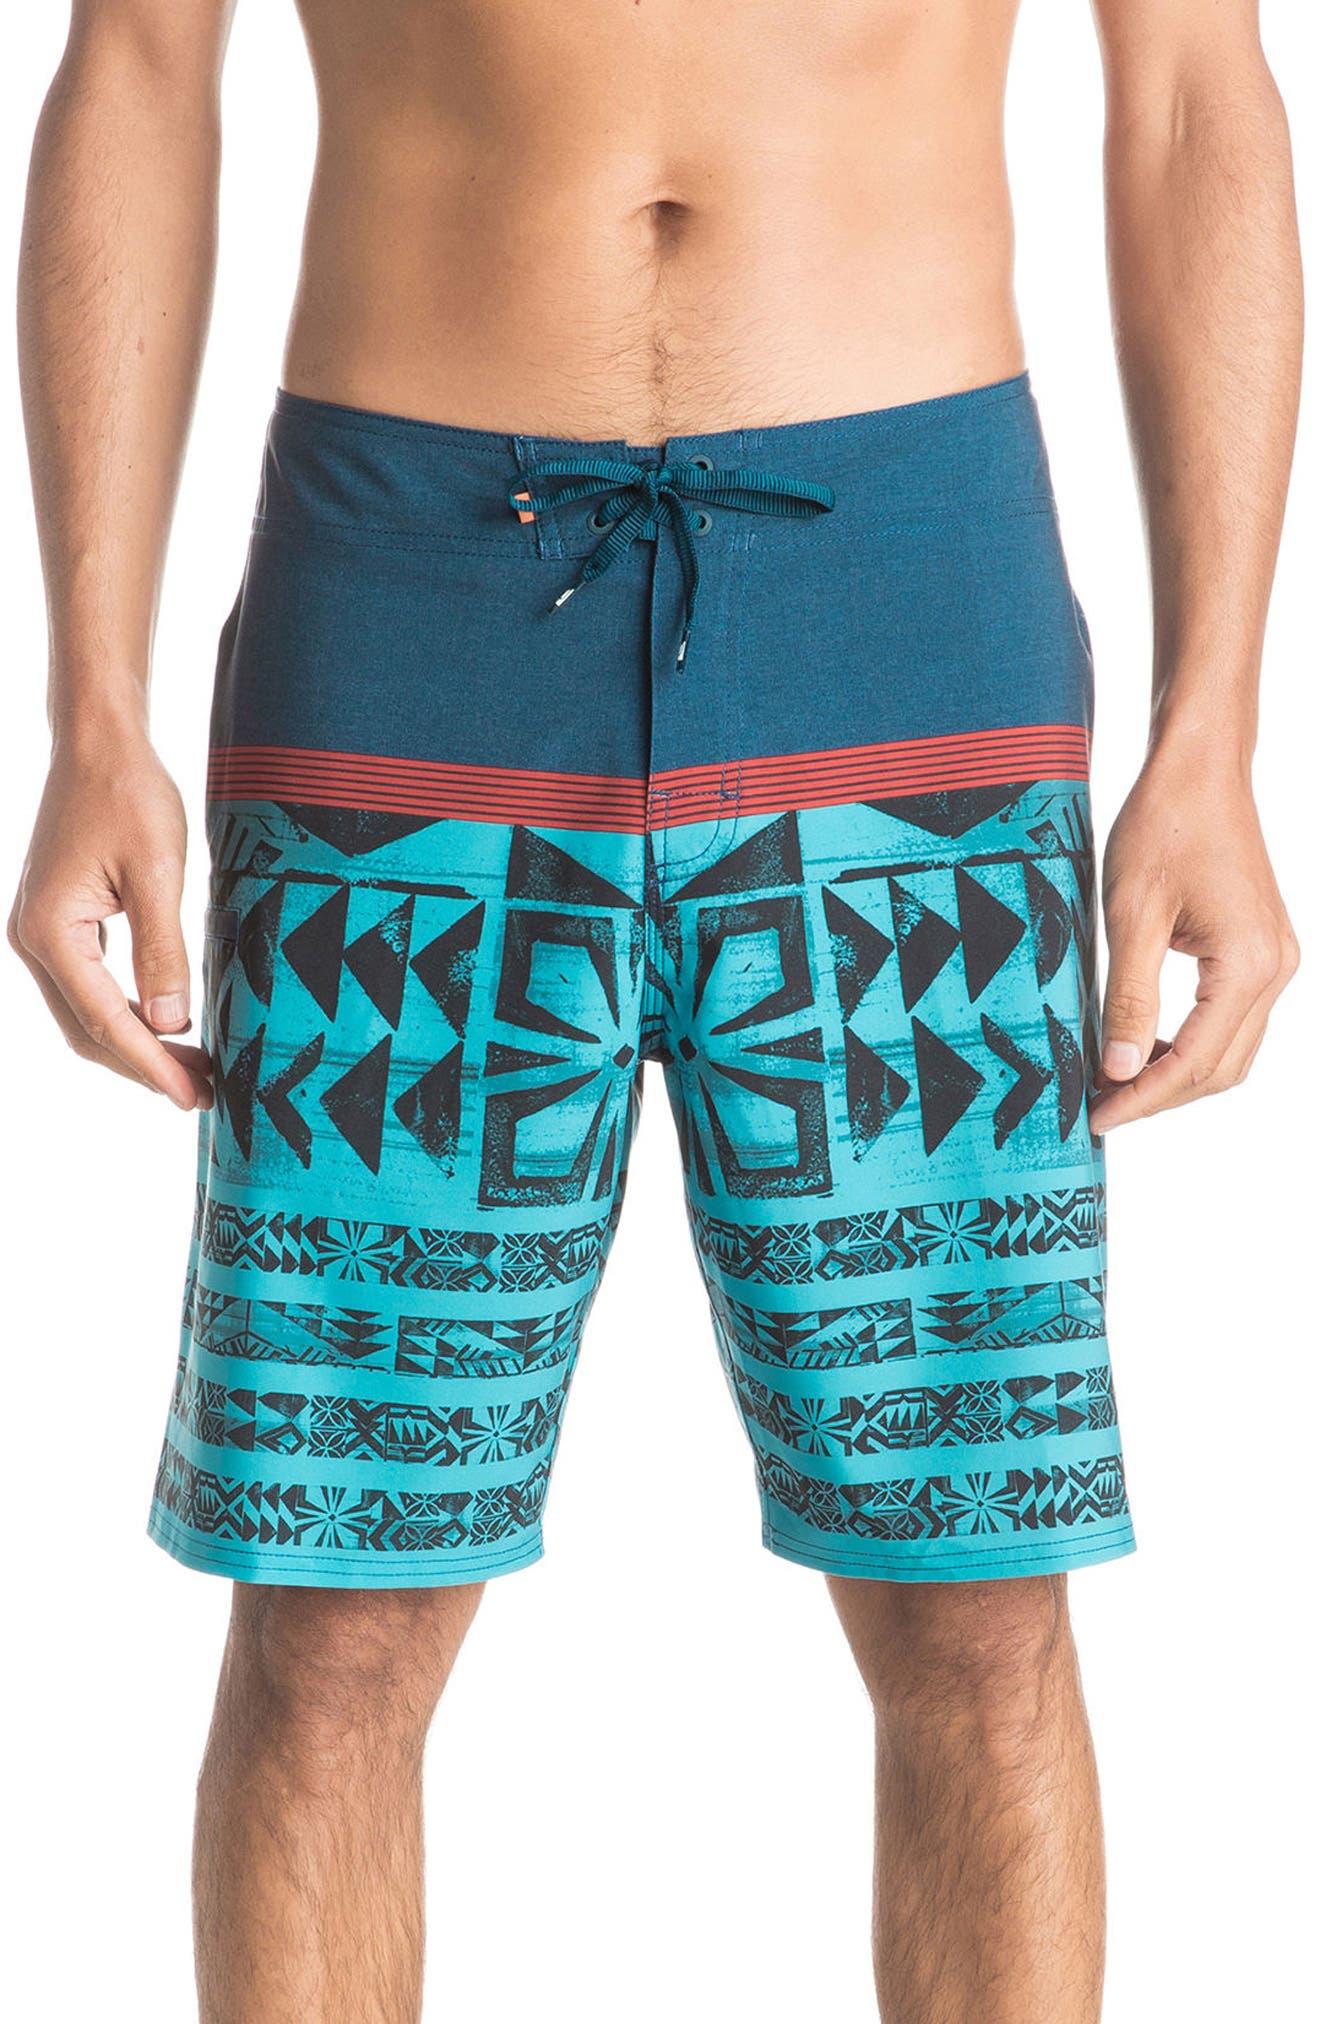 Quiksilver Ocean Warrior Board Shorts